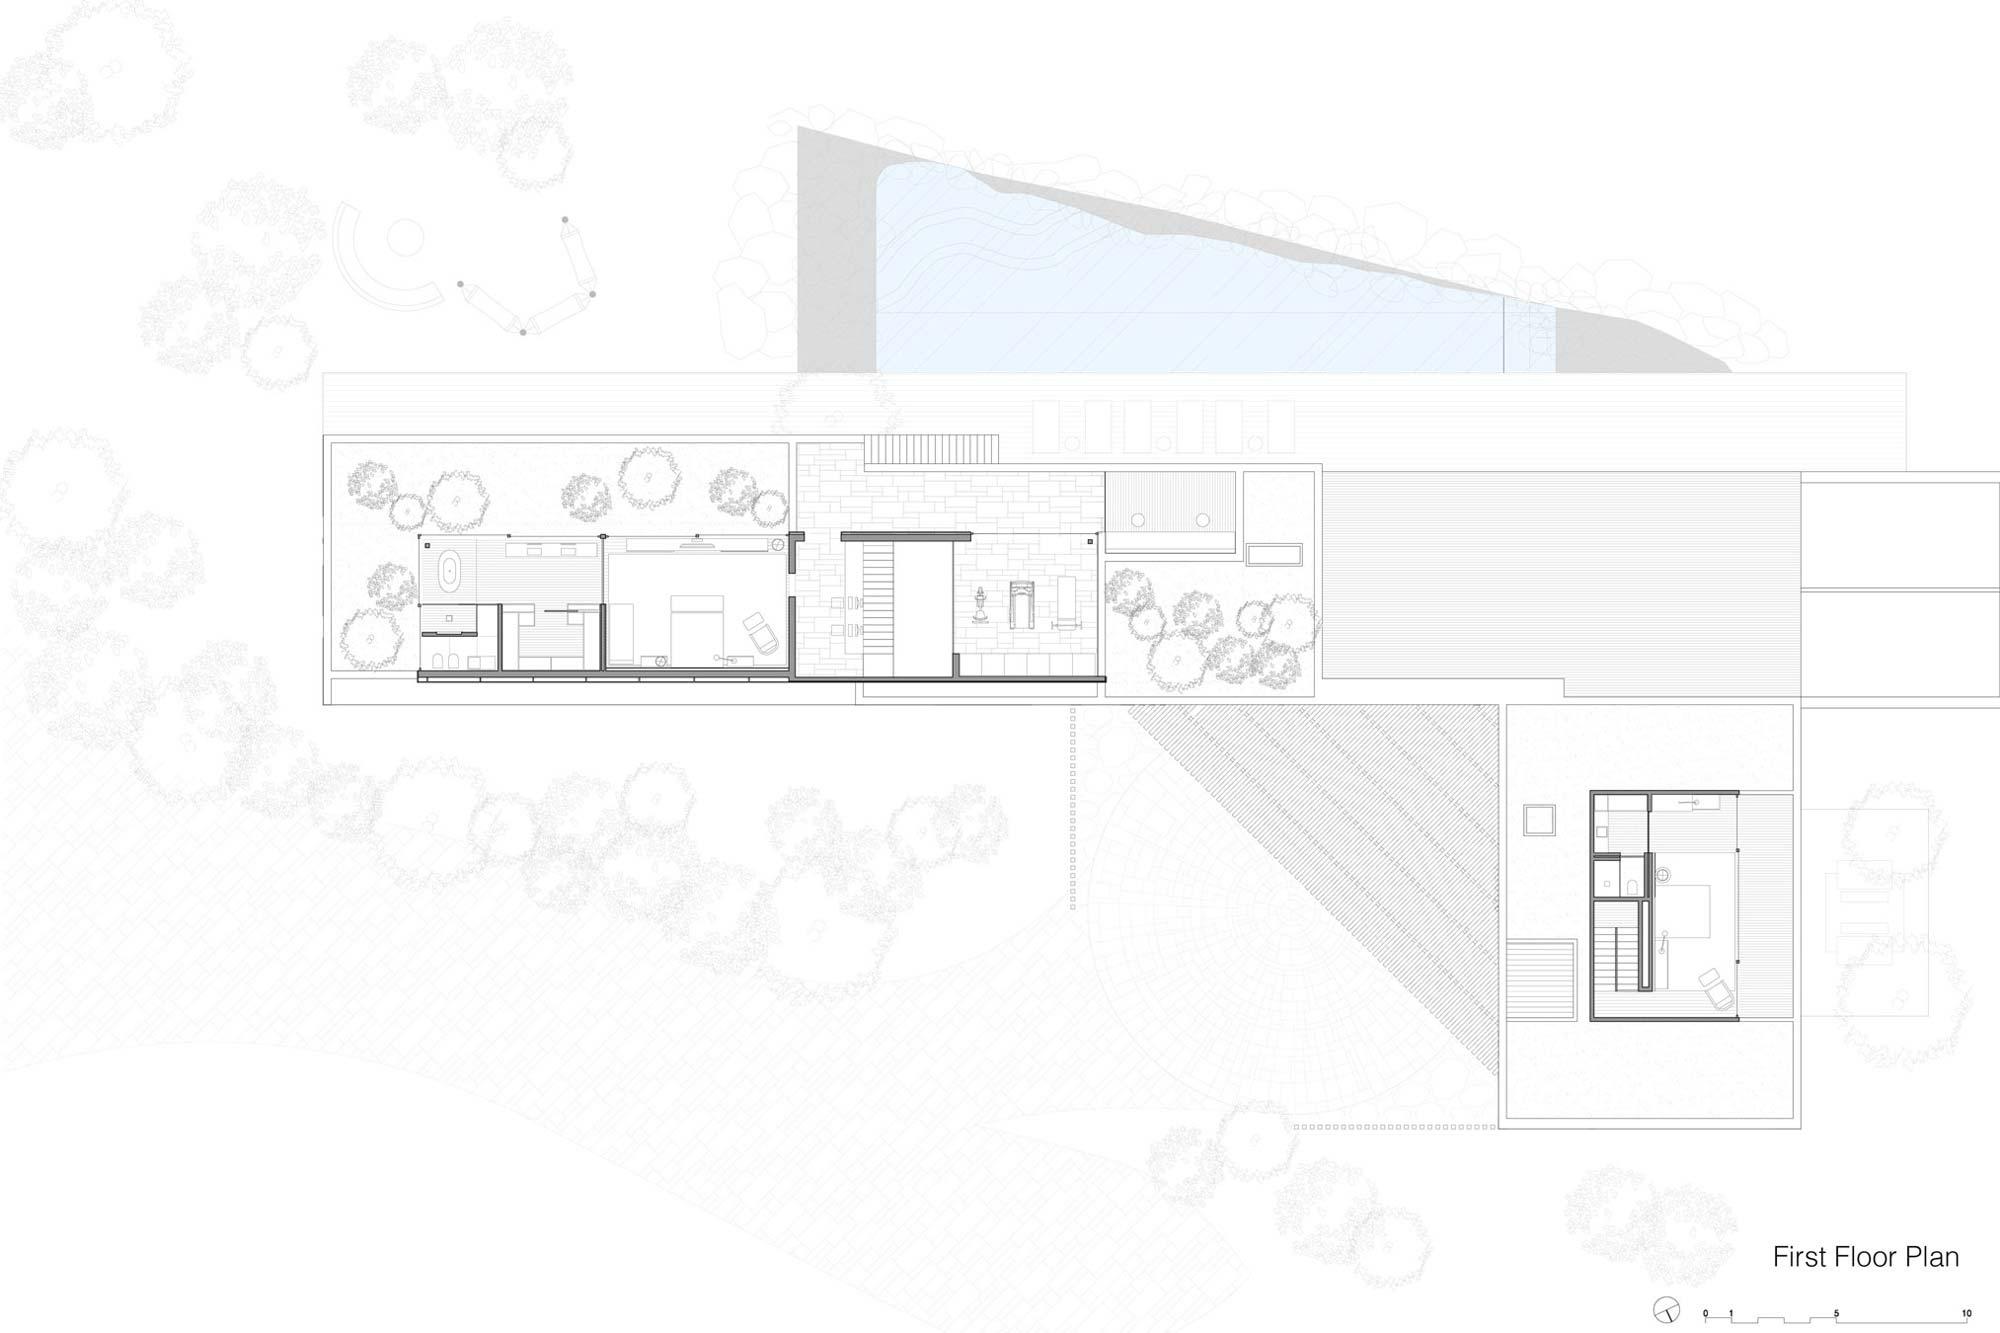 First Floor Plan, Casa Itu in São Paulo, Brazil by Studio Arthur Casas